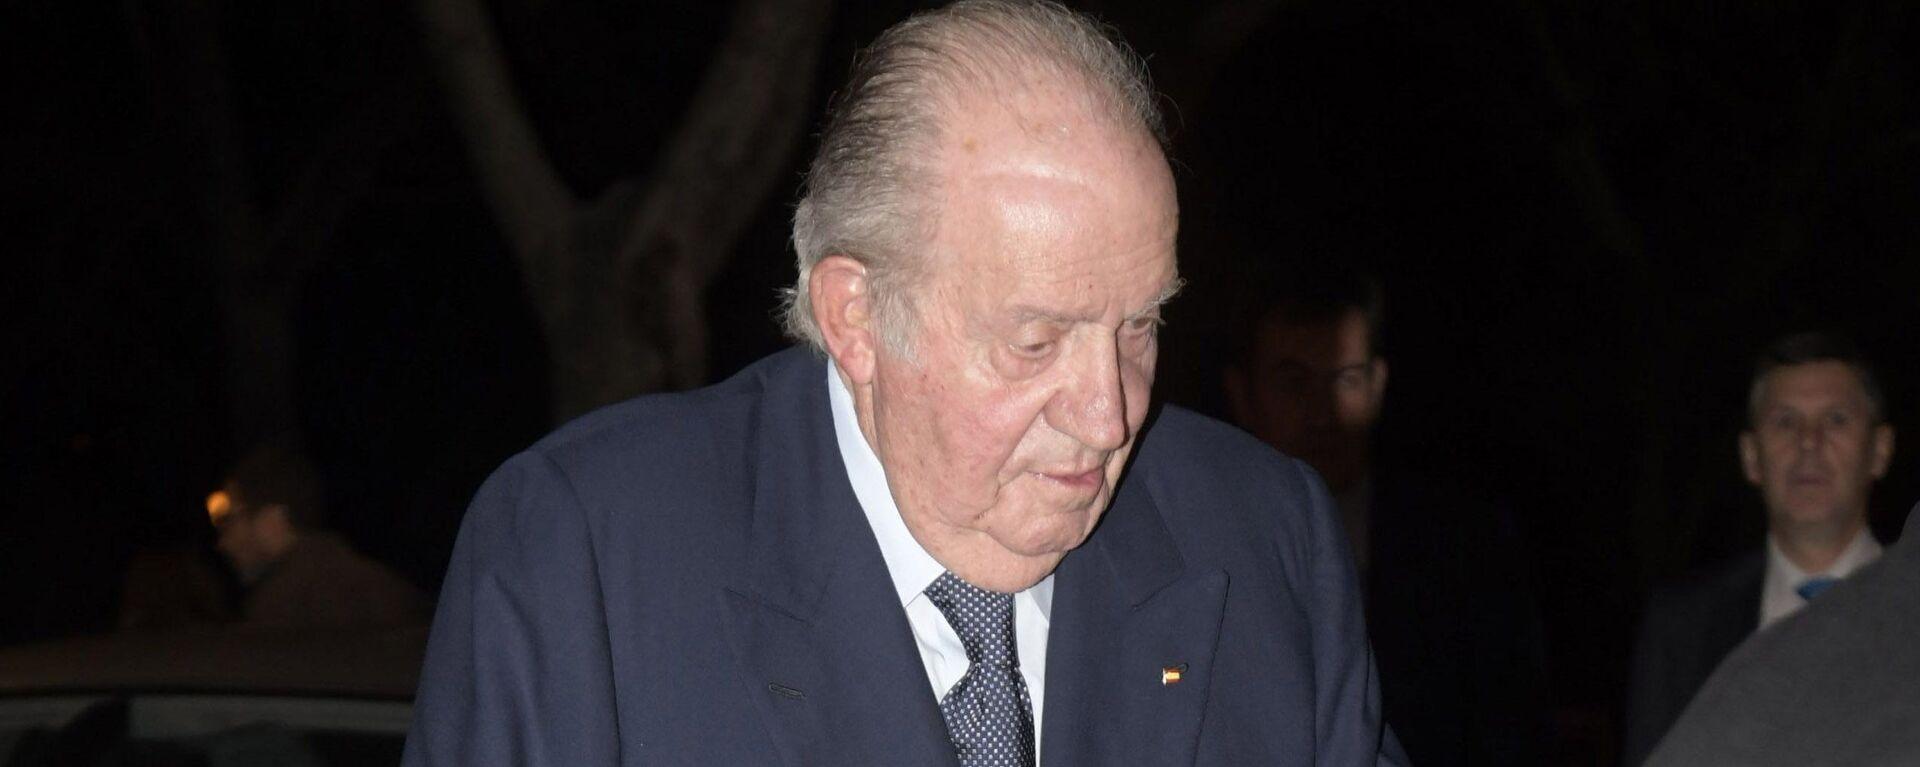 El rey emérito de España Juan Carlos I - Sputnik Mundo, 1920, 15.06.2021